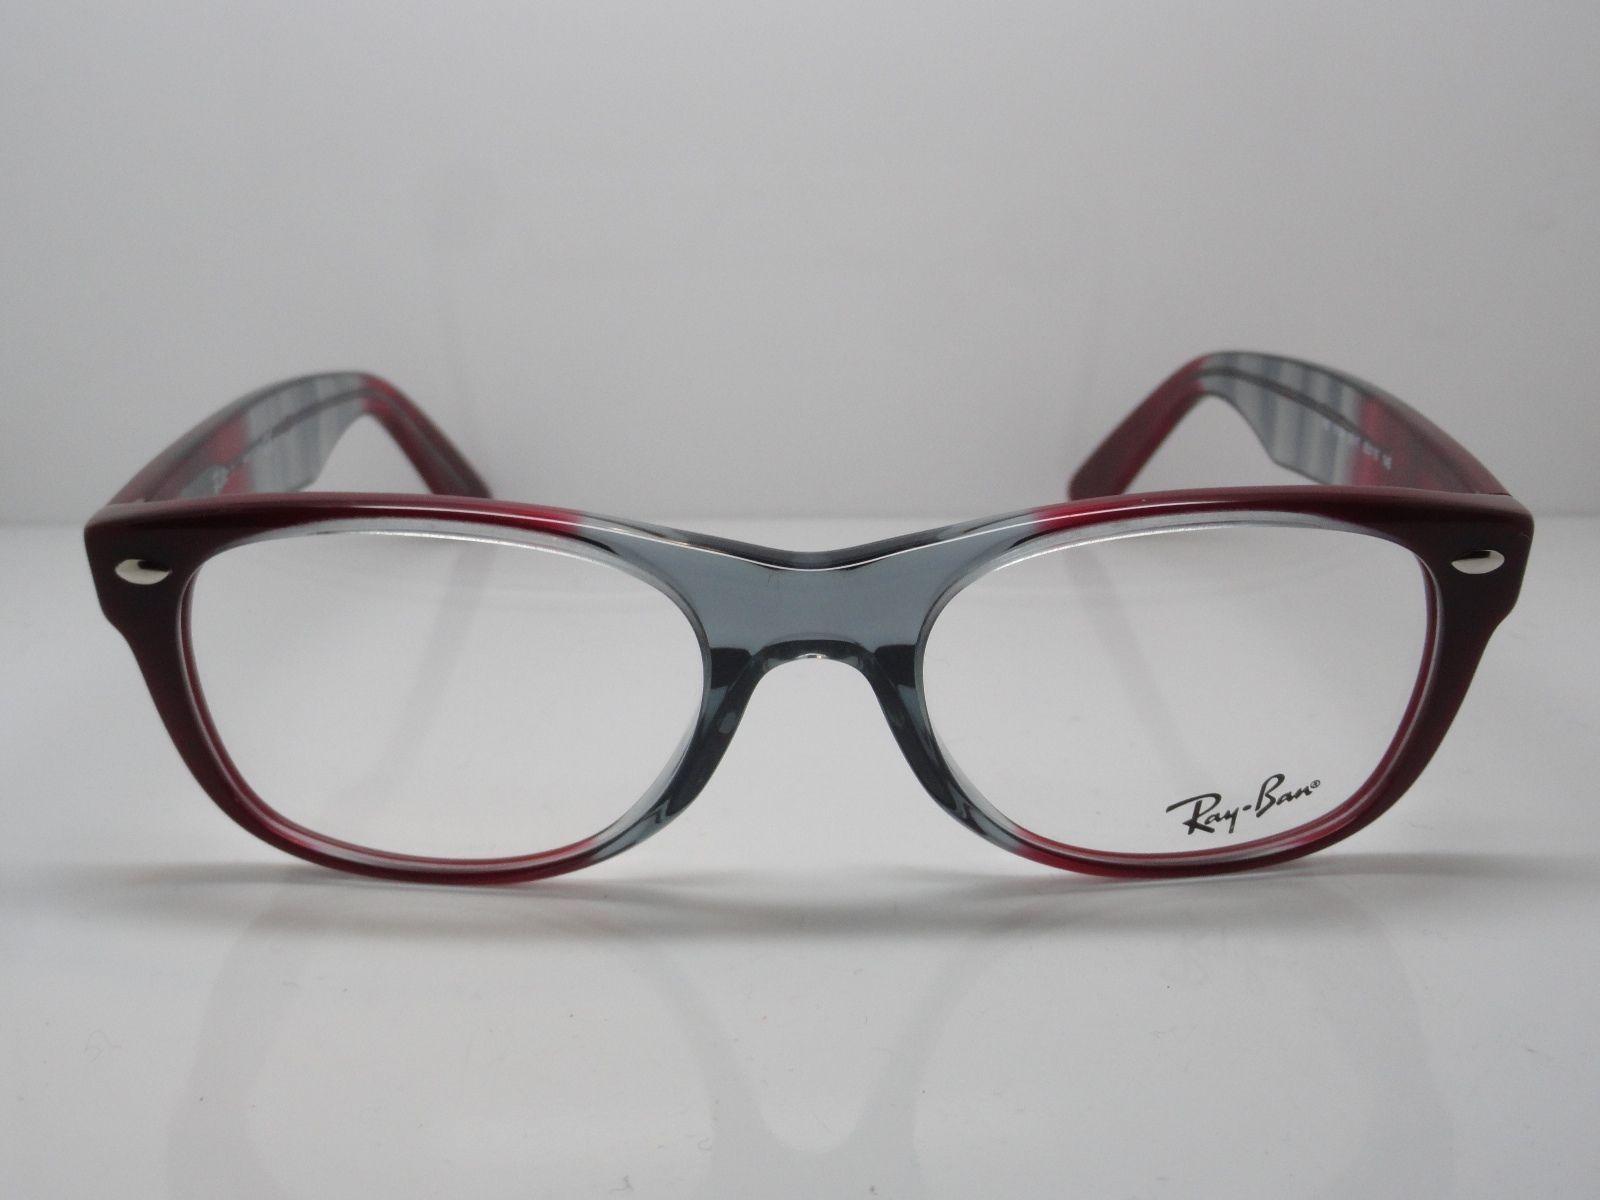 bbf91017bc6 Ray Ban RB 5184 5517 New Wayfarer Red Grey and 50 similar items